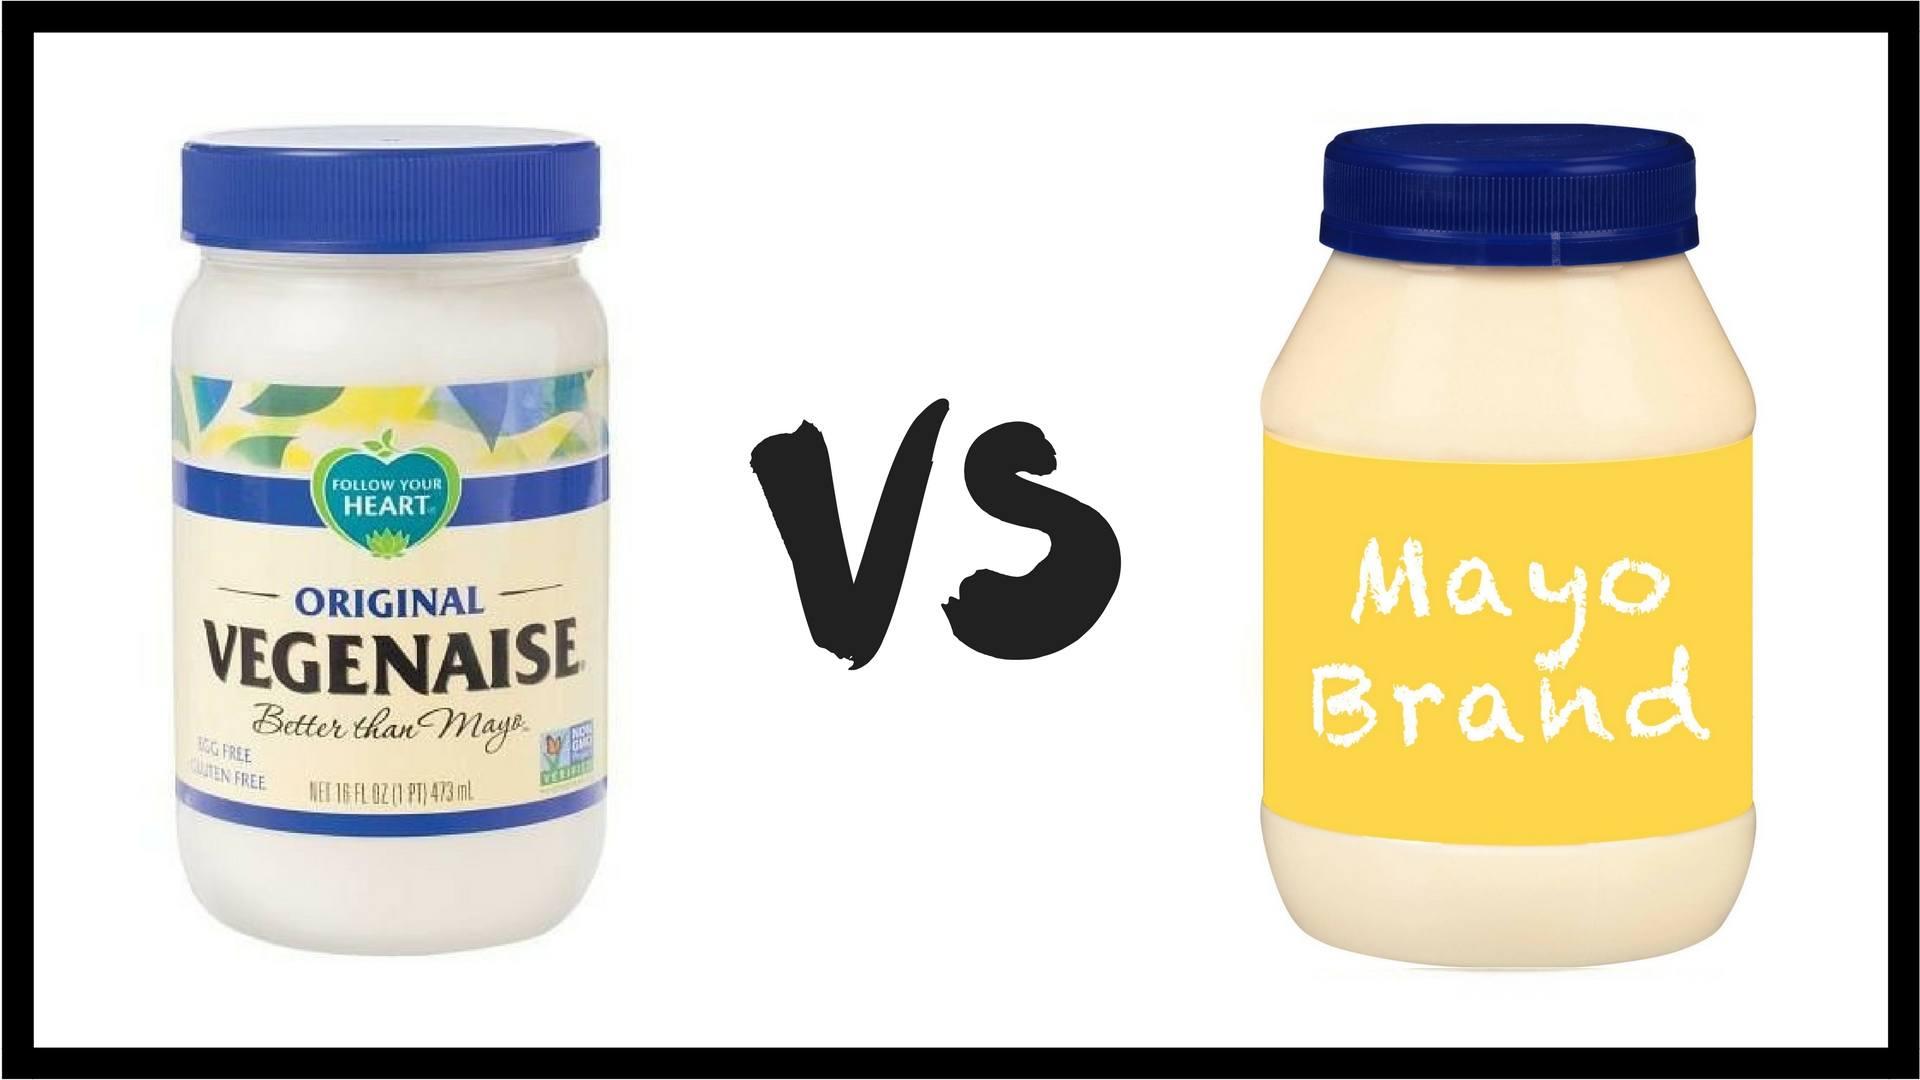 Vegenaise vs Mayonnaise: What's the Big